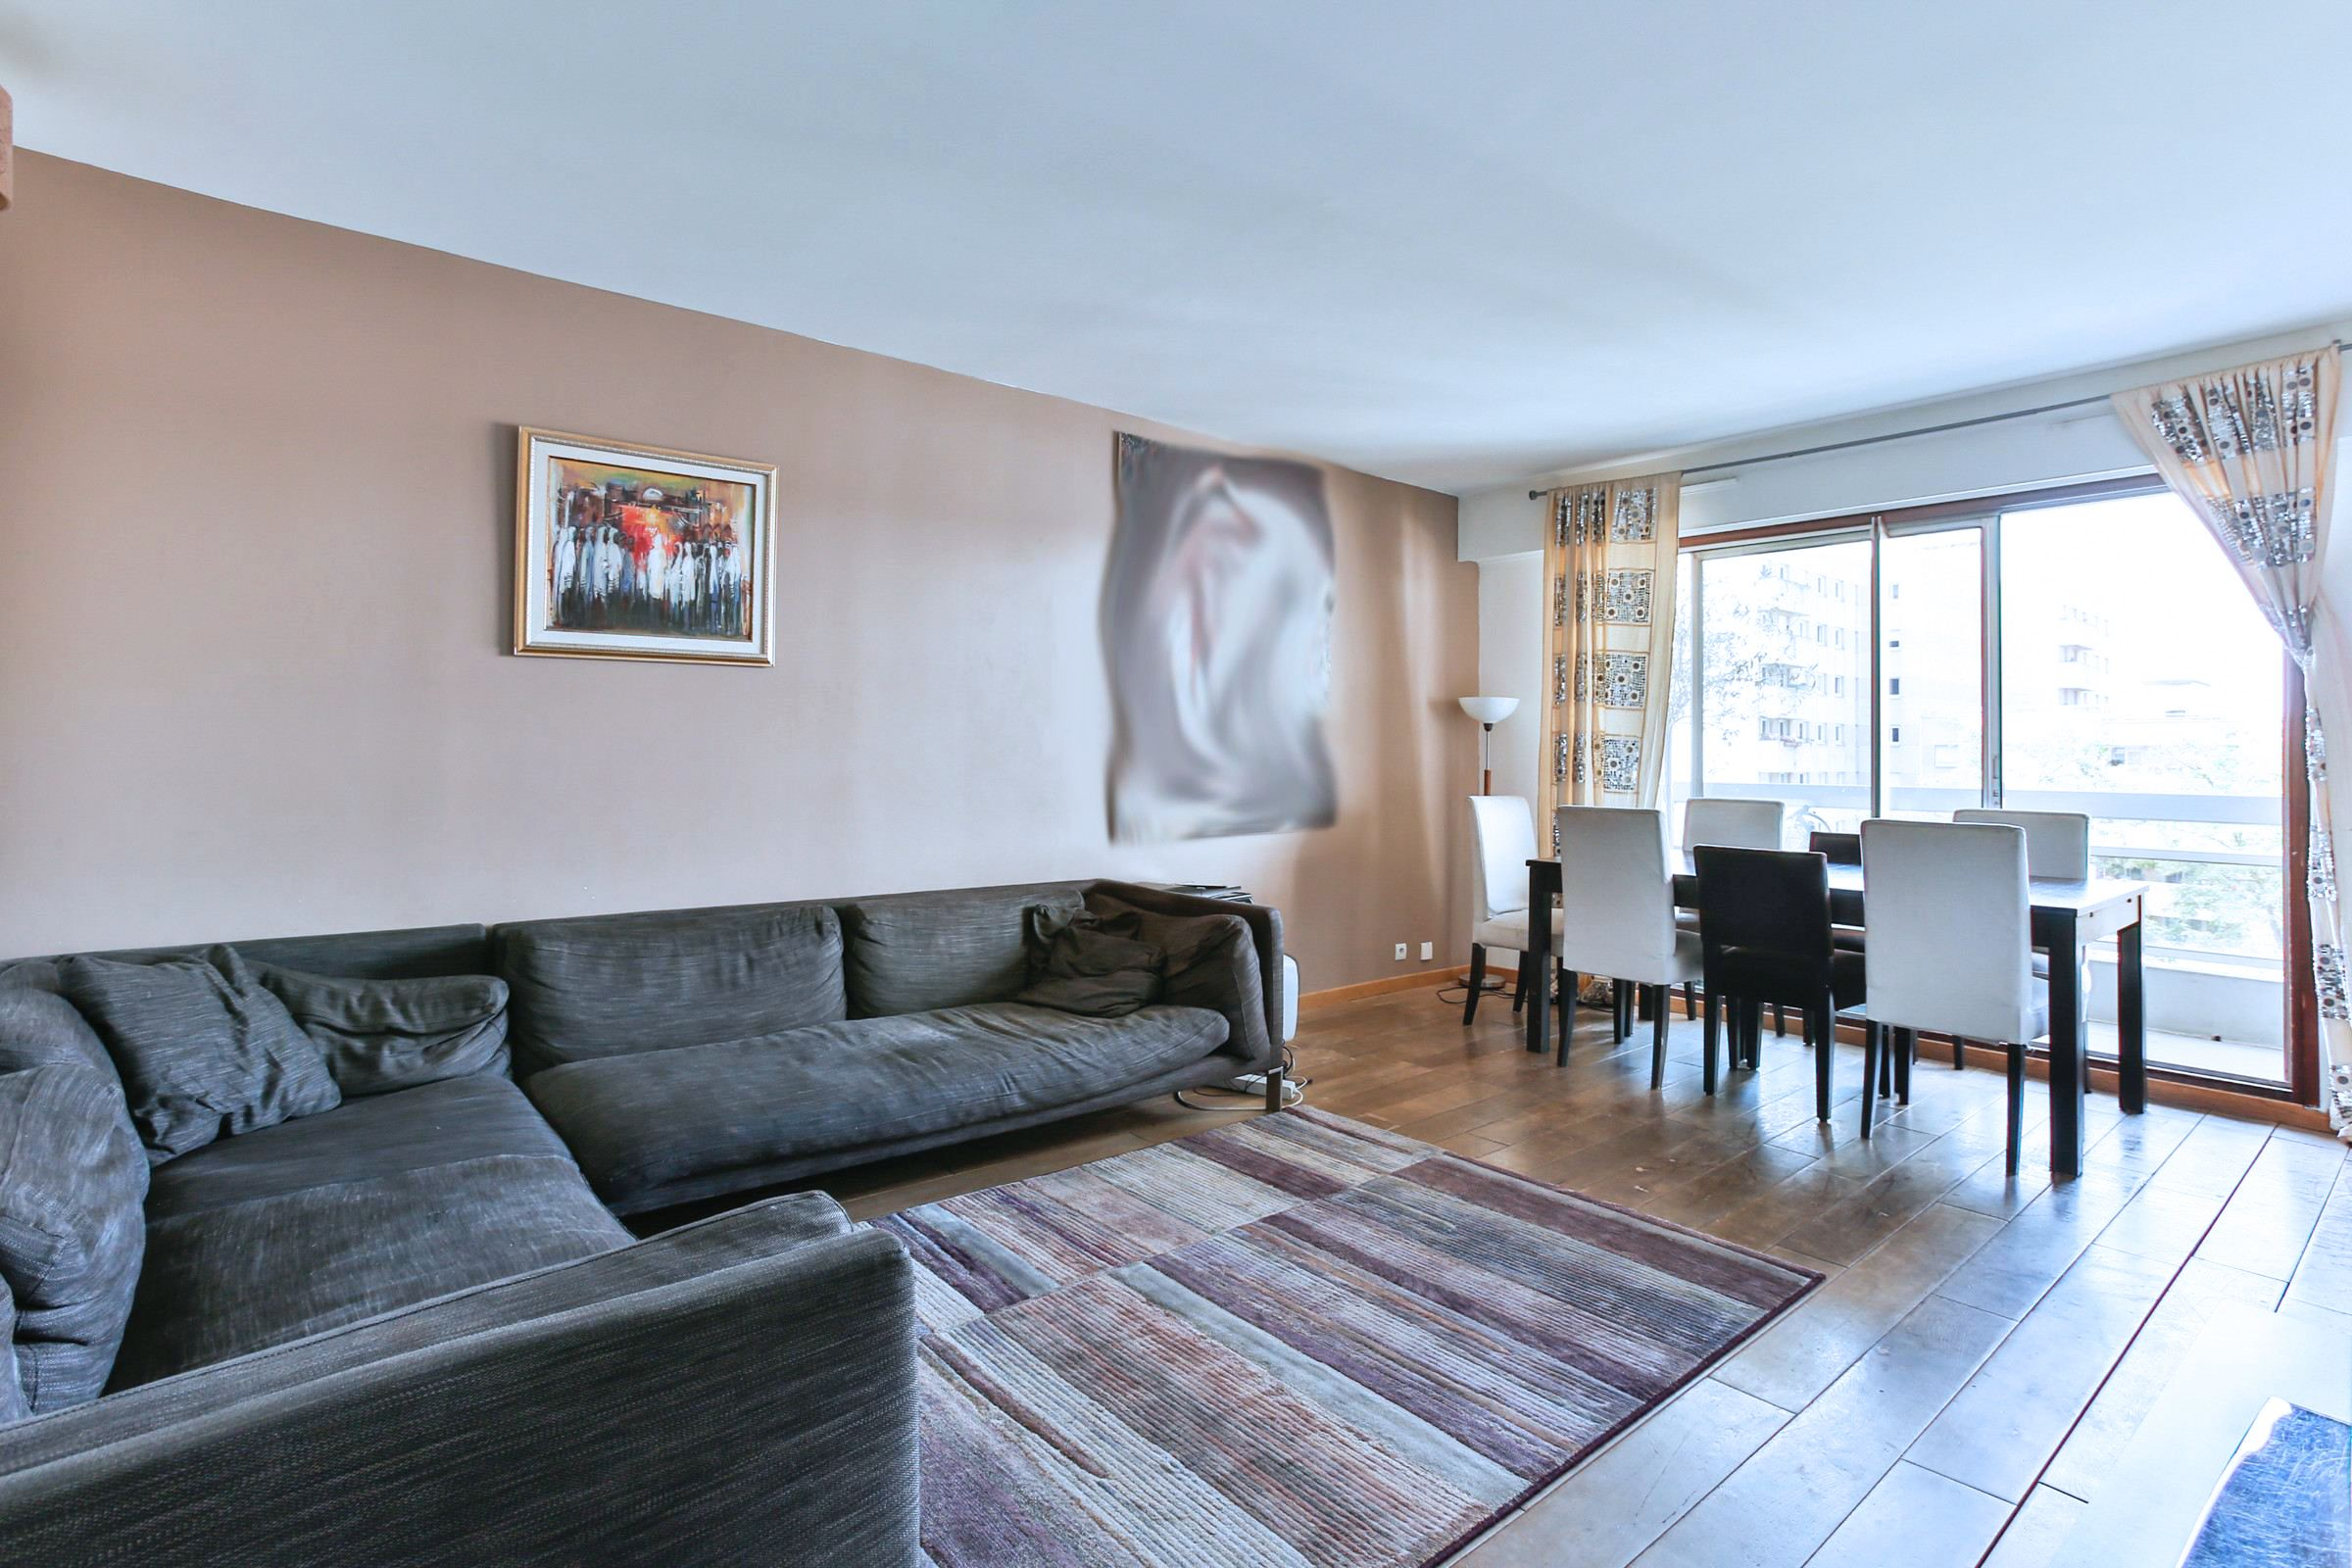 Apartamento para Venda às Paris 11 - Oberkampf. A 3 rooms apartment, open view, volume Paris, Paris 75011 França